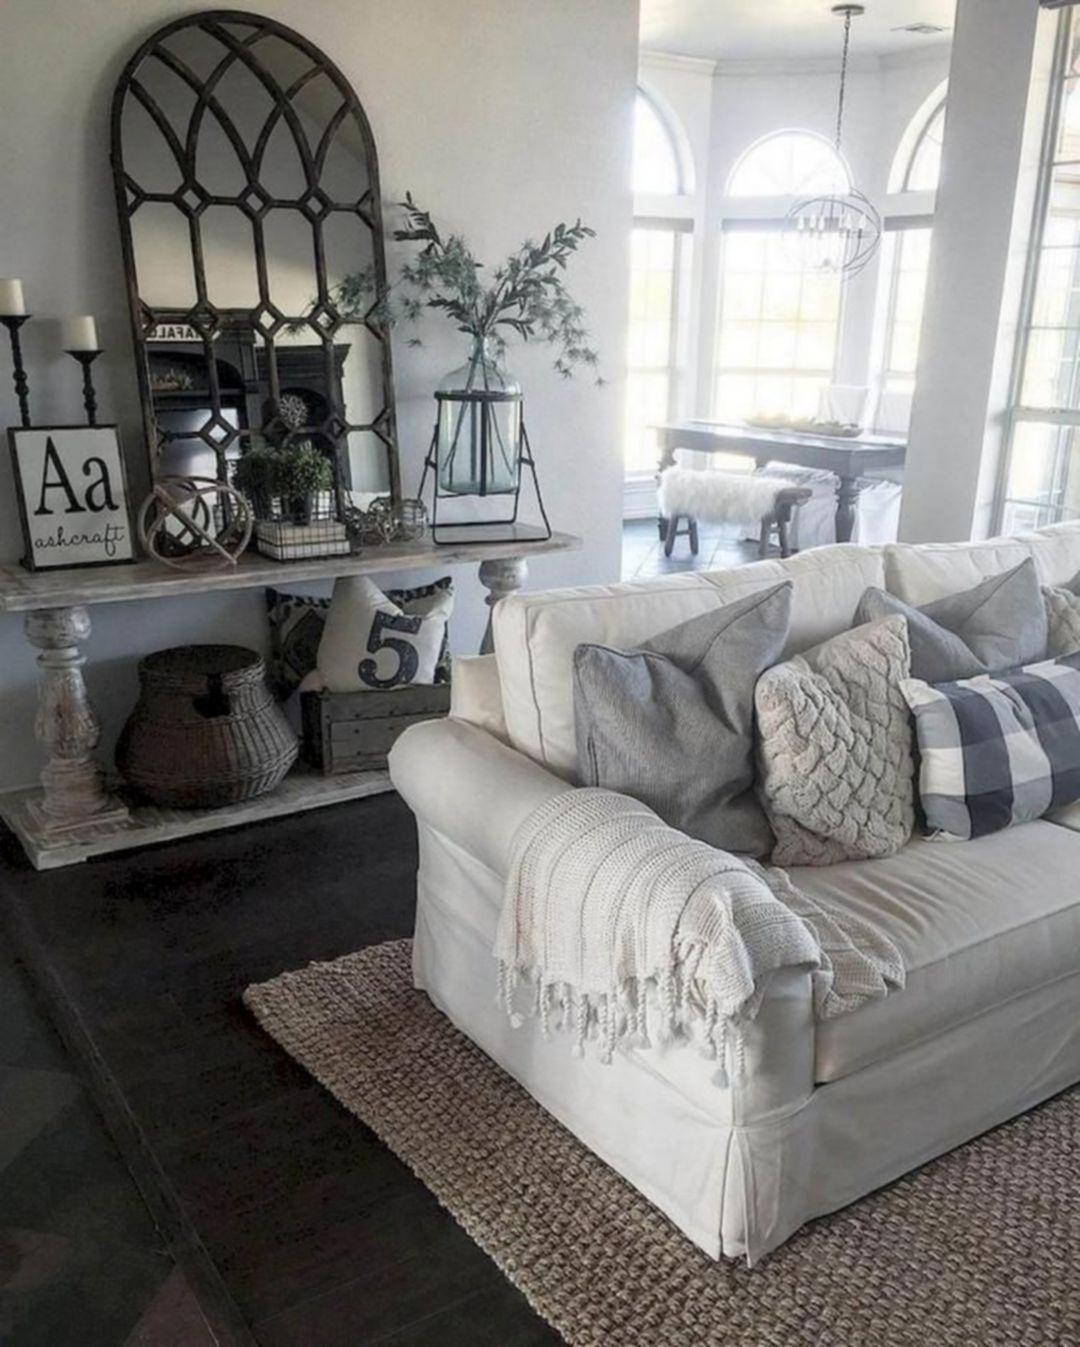 modern farmhouse decor ideas 25 beautiful pictures on colors for farmhouse living room id=93901